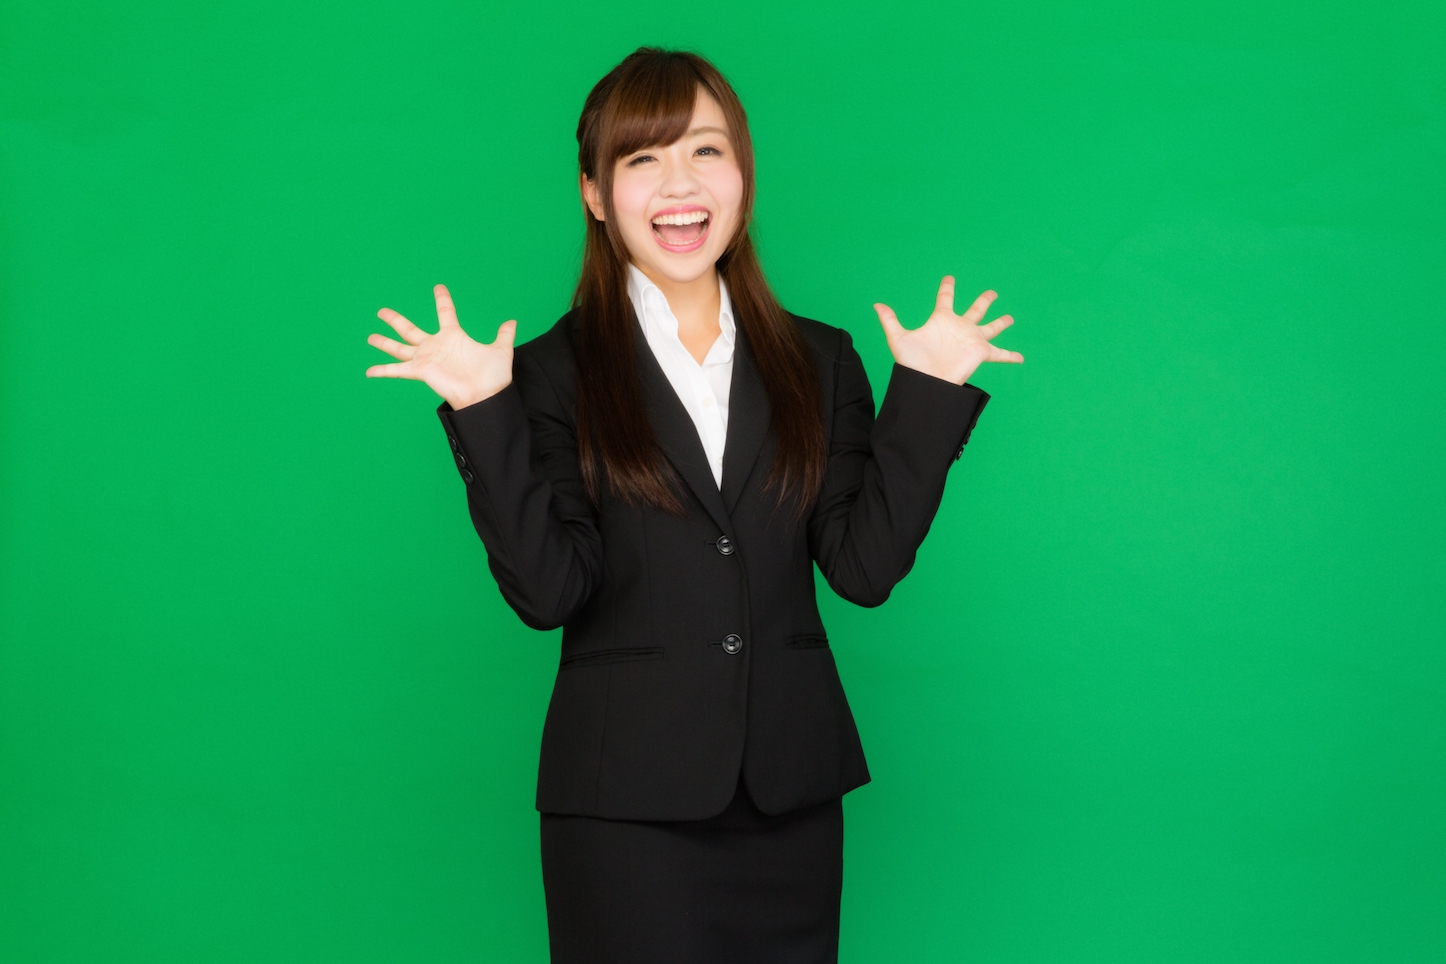 yuka-kawamura-greenback-4.jpg